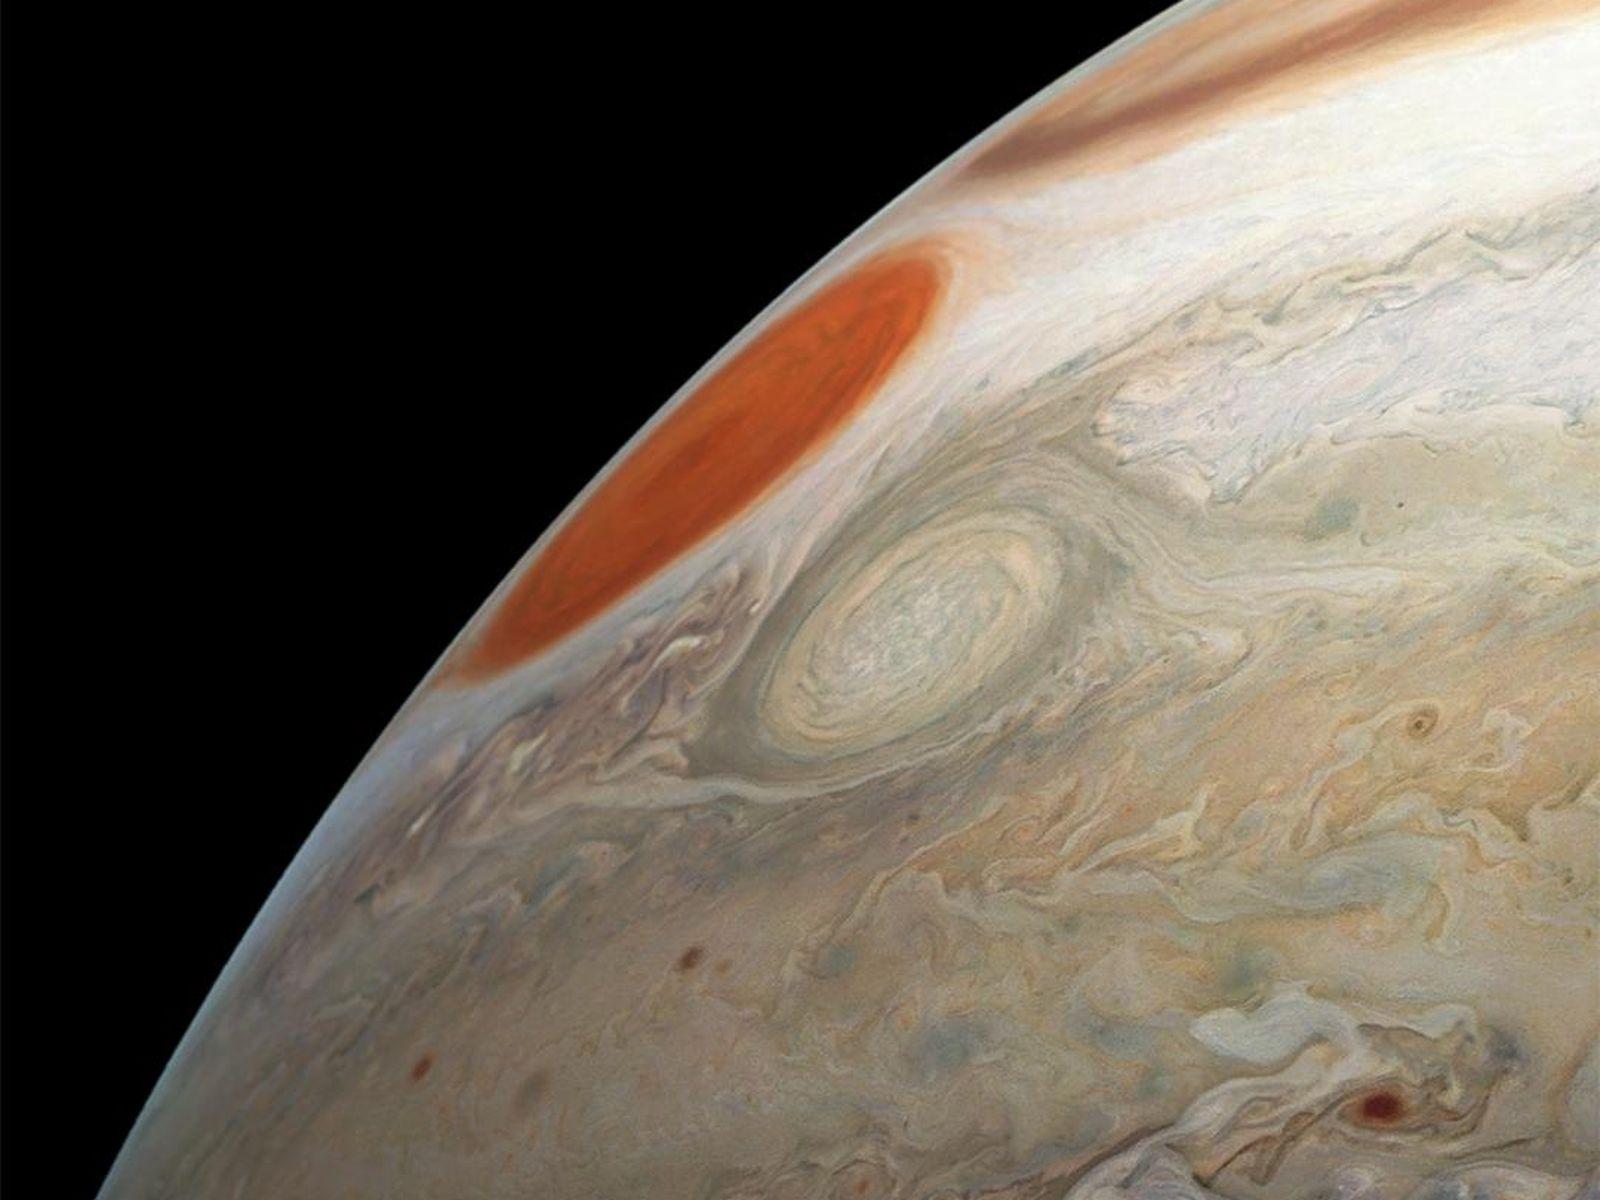 La sonde Juno a pris de superbes photos de tempêtes jumelles sur Jupiter